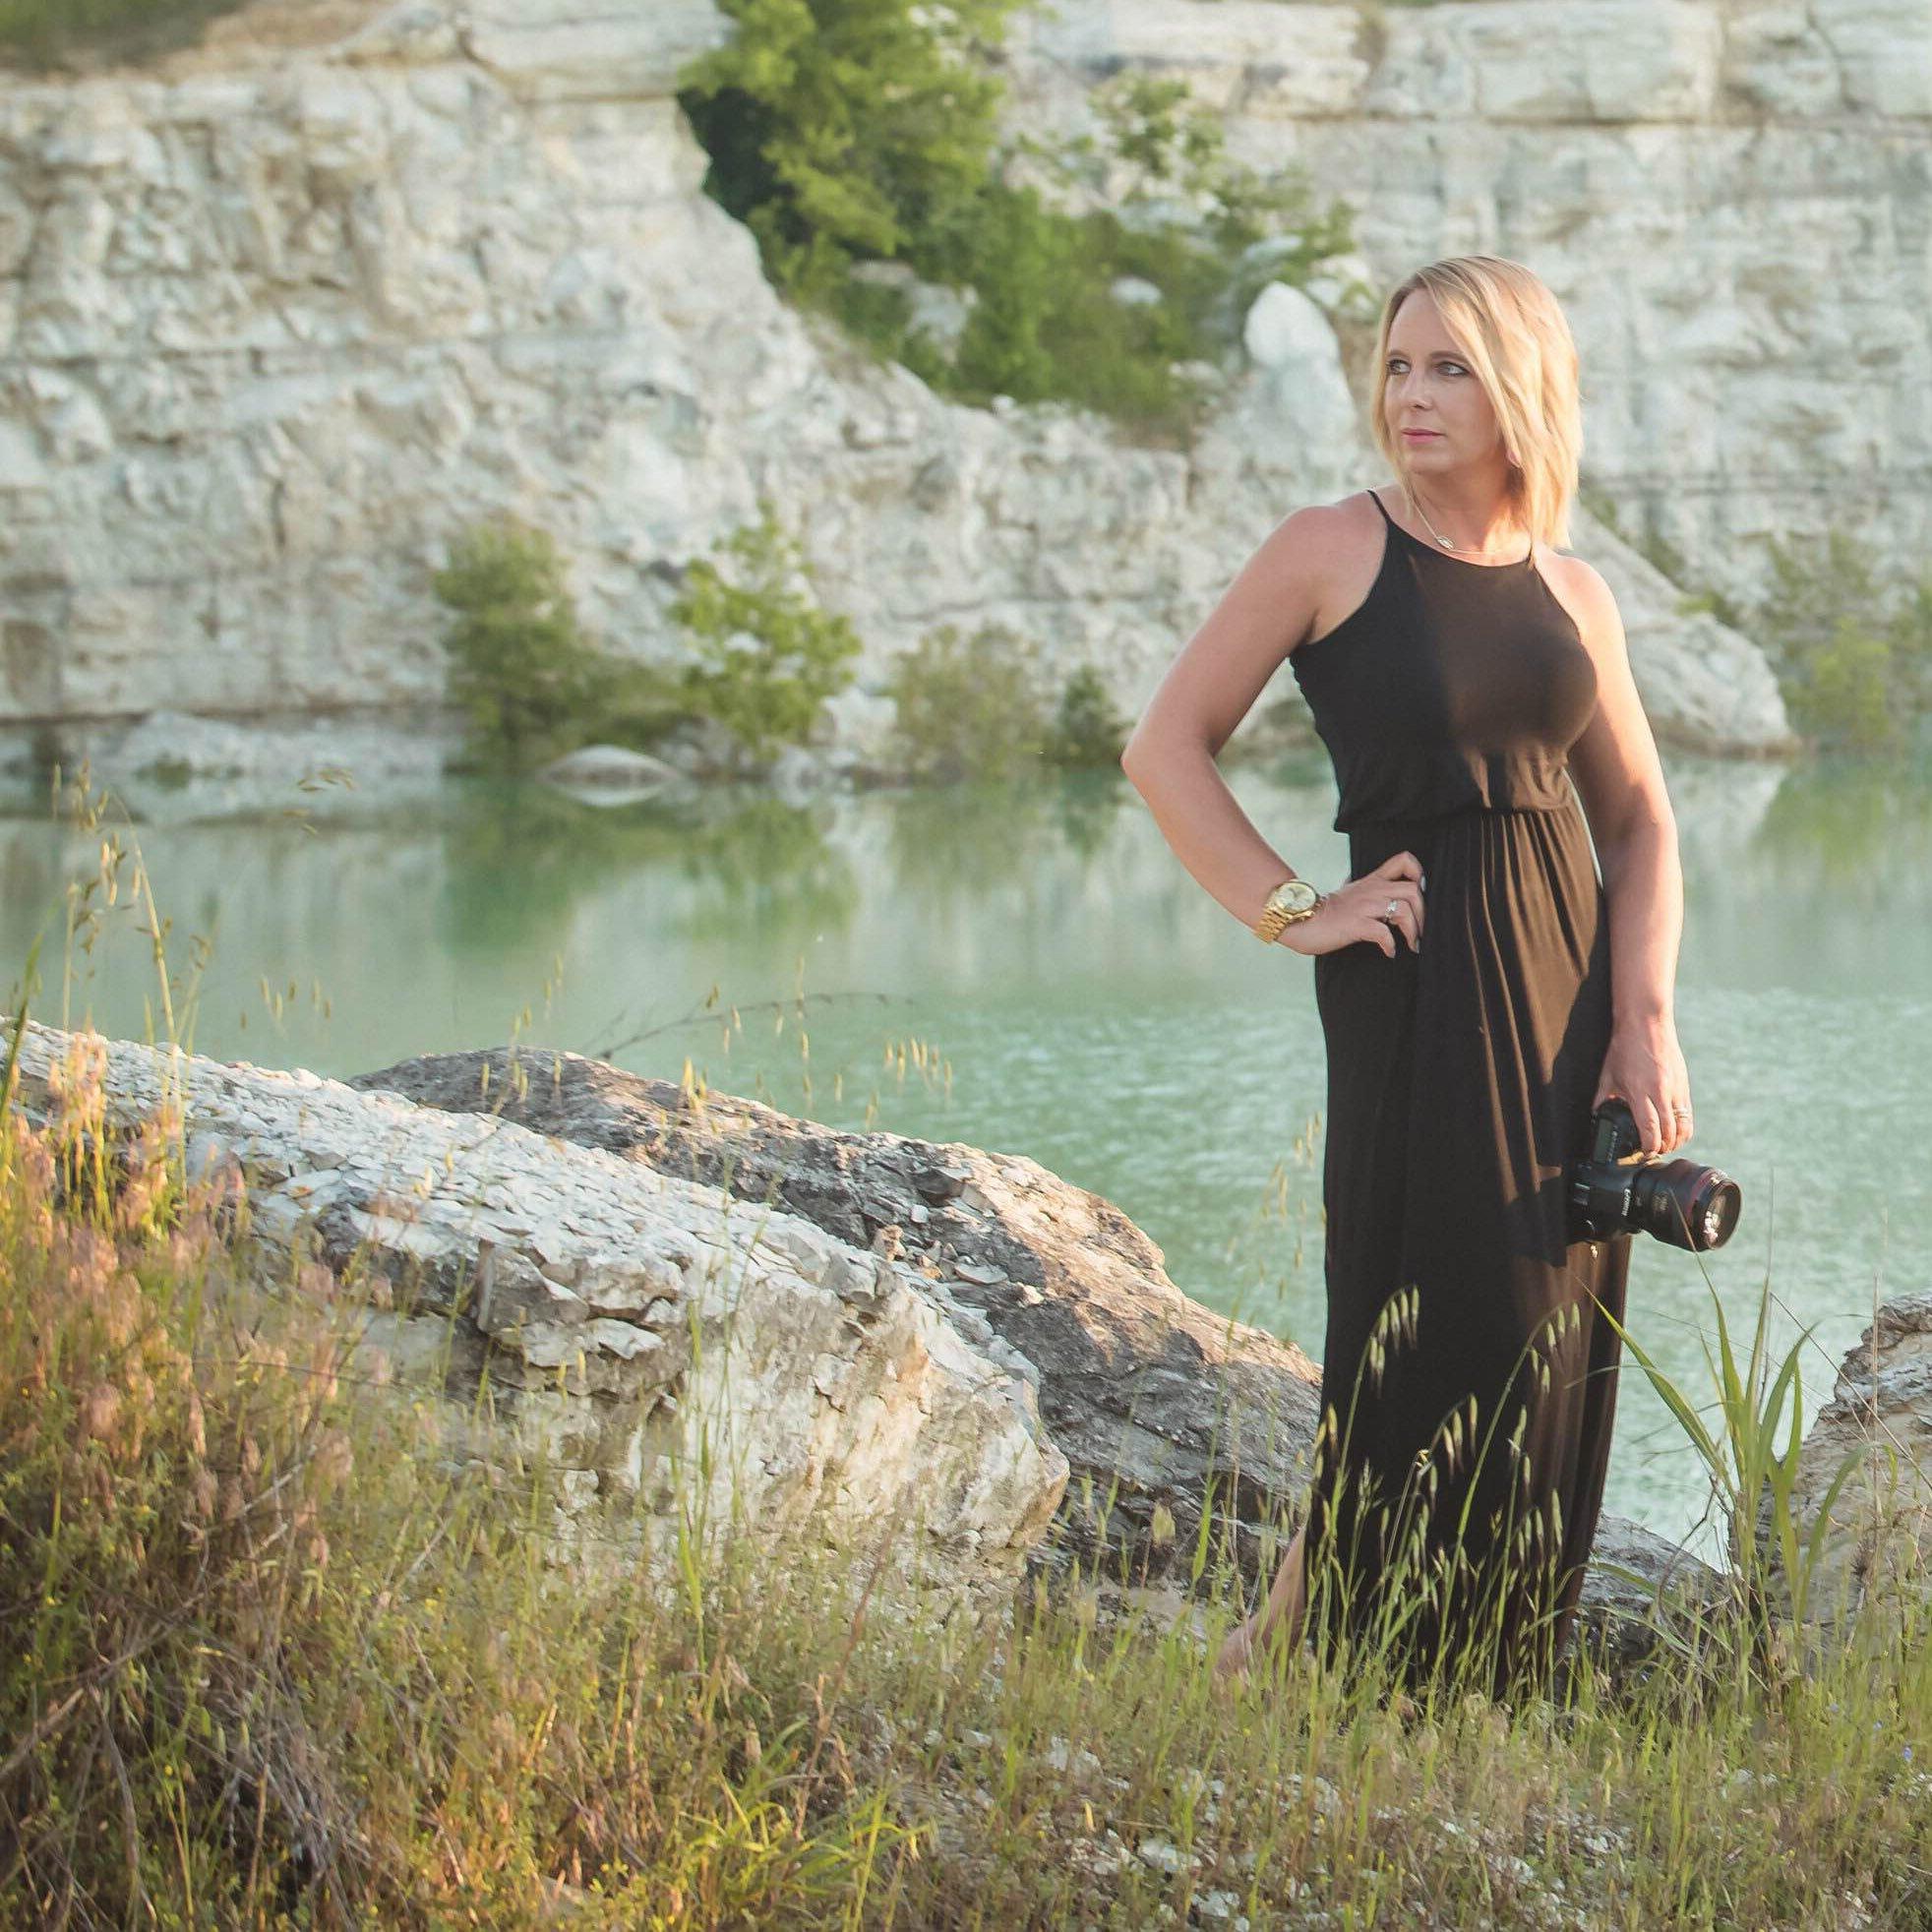 Alyssa Turner headshot in Dallas Texas